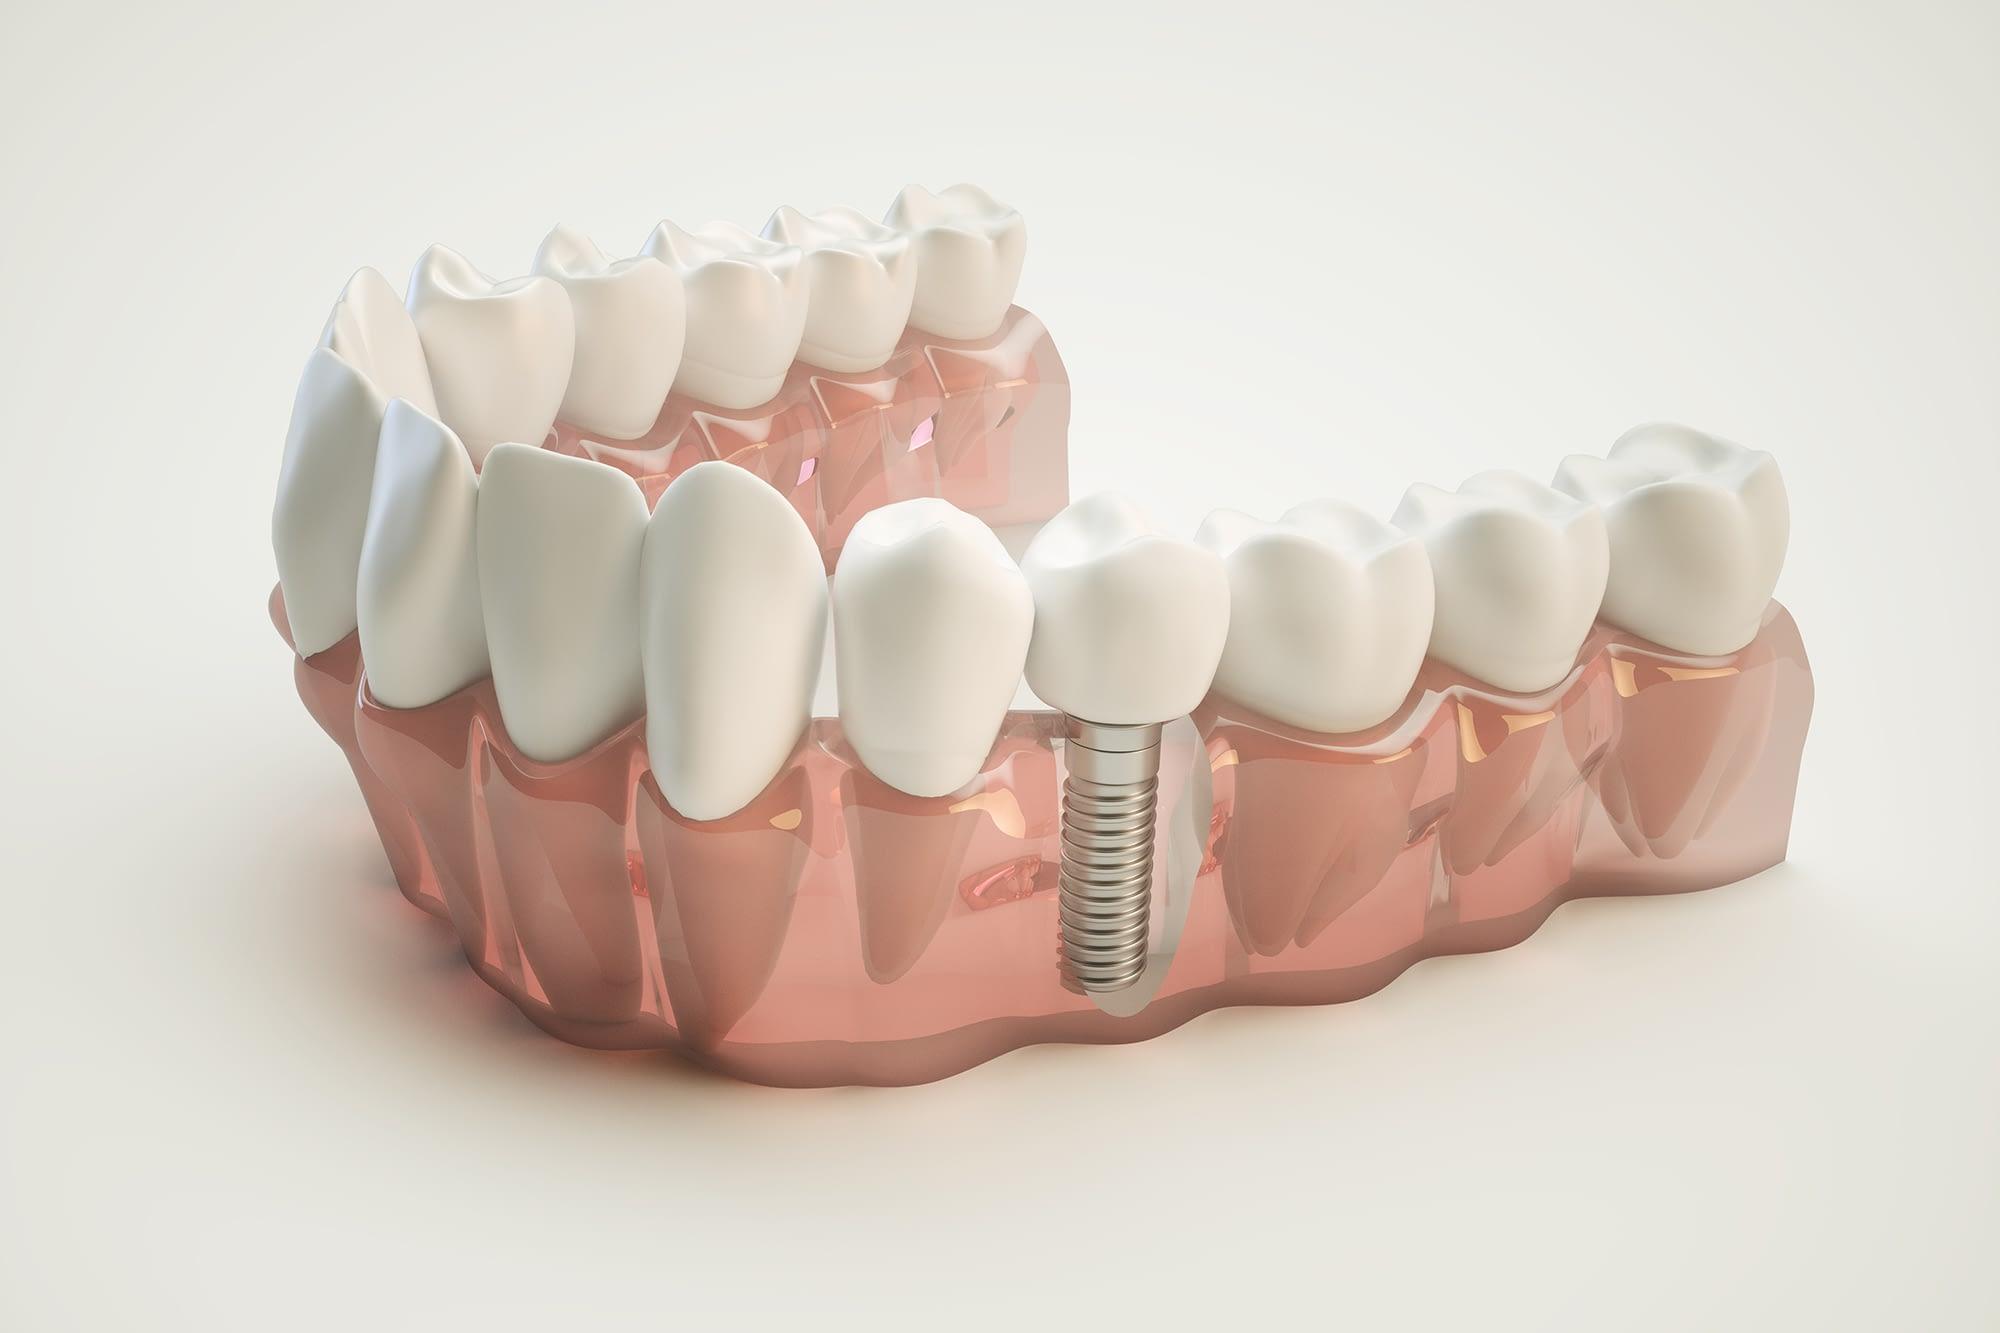 Dental Implants - Charleston, SC